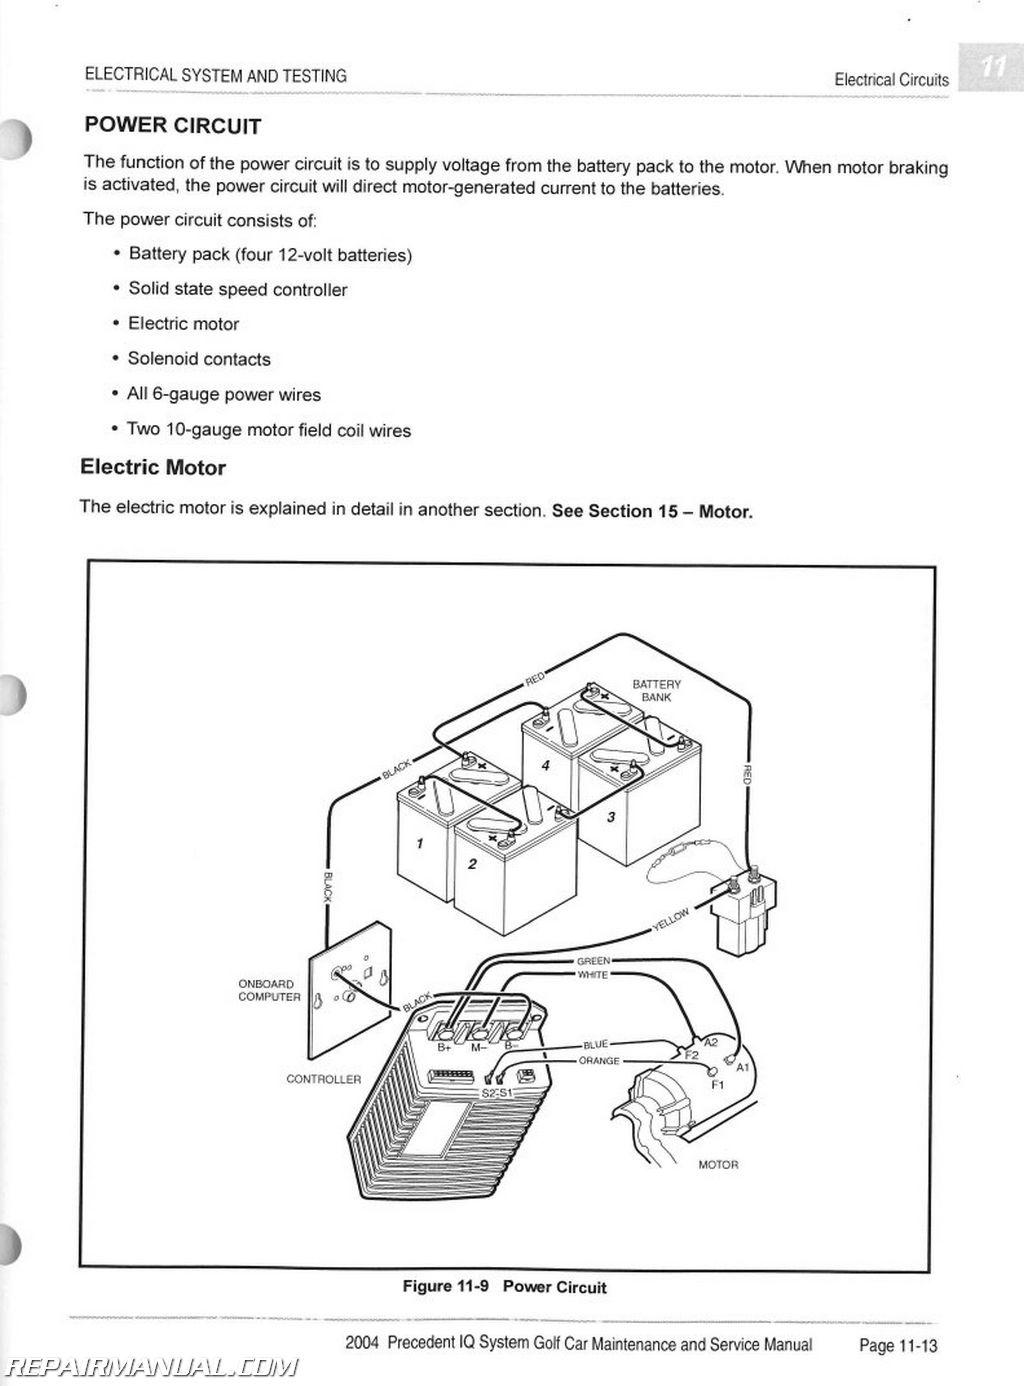 Ezgo Golf Cart Horn Car Repair Manuals And Wiring Diagrams 48 Volt Club Diagram Buggiesgonewild Electric 2008 Gas 1994